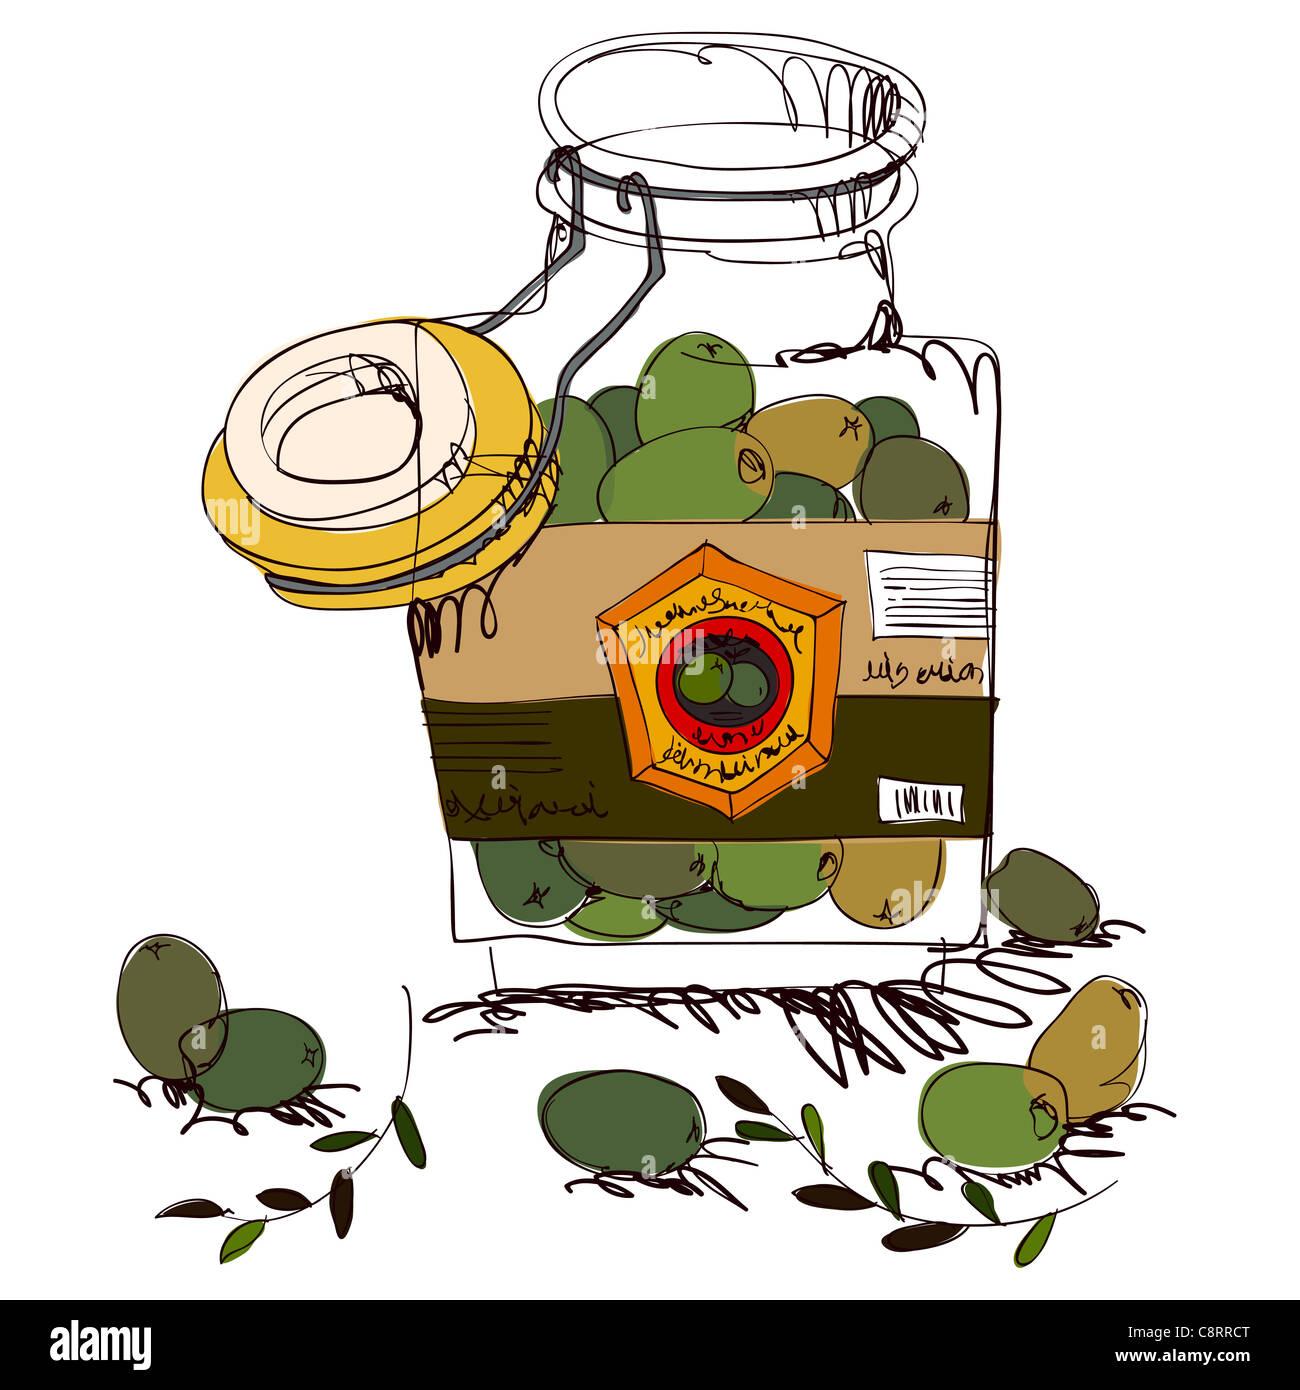 Giant Green Olive In Jar - Stock Image